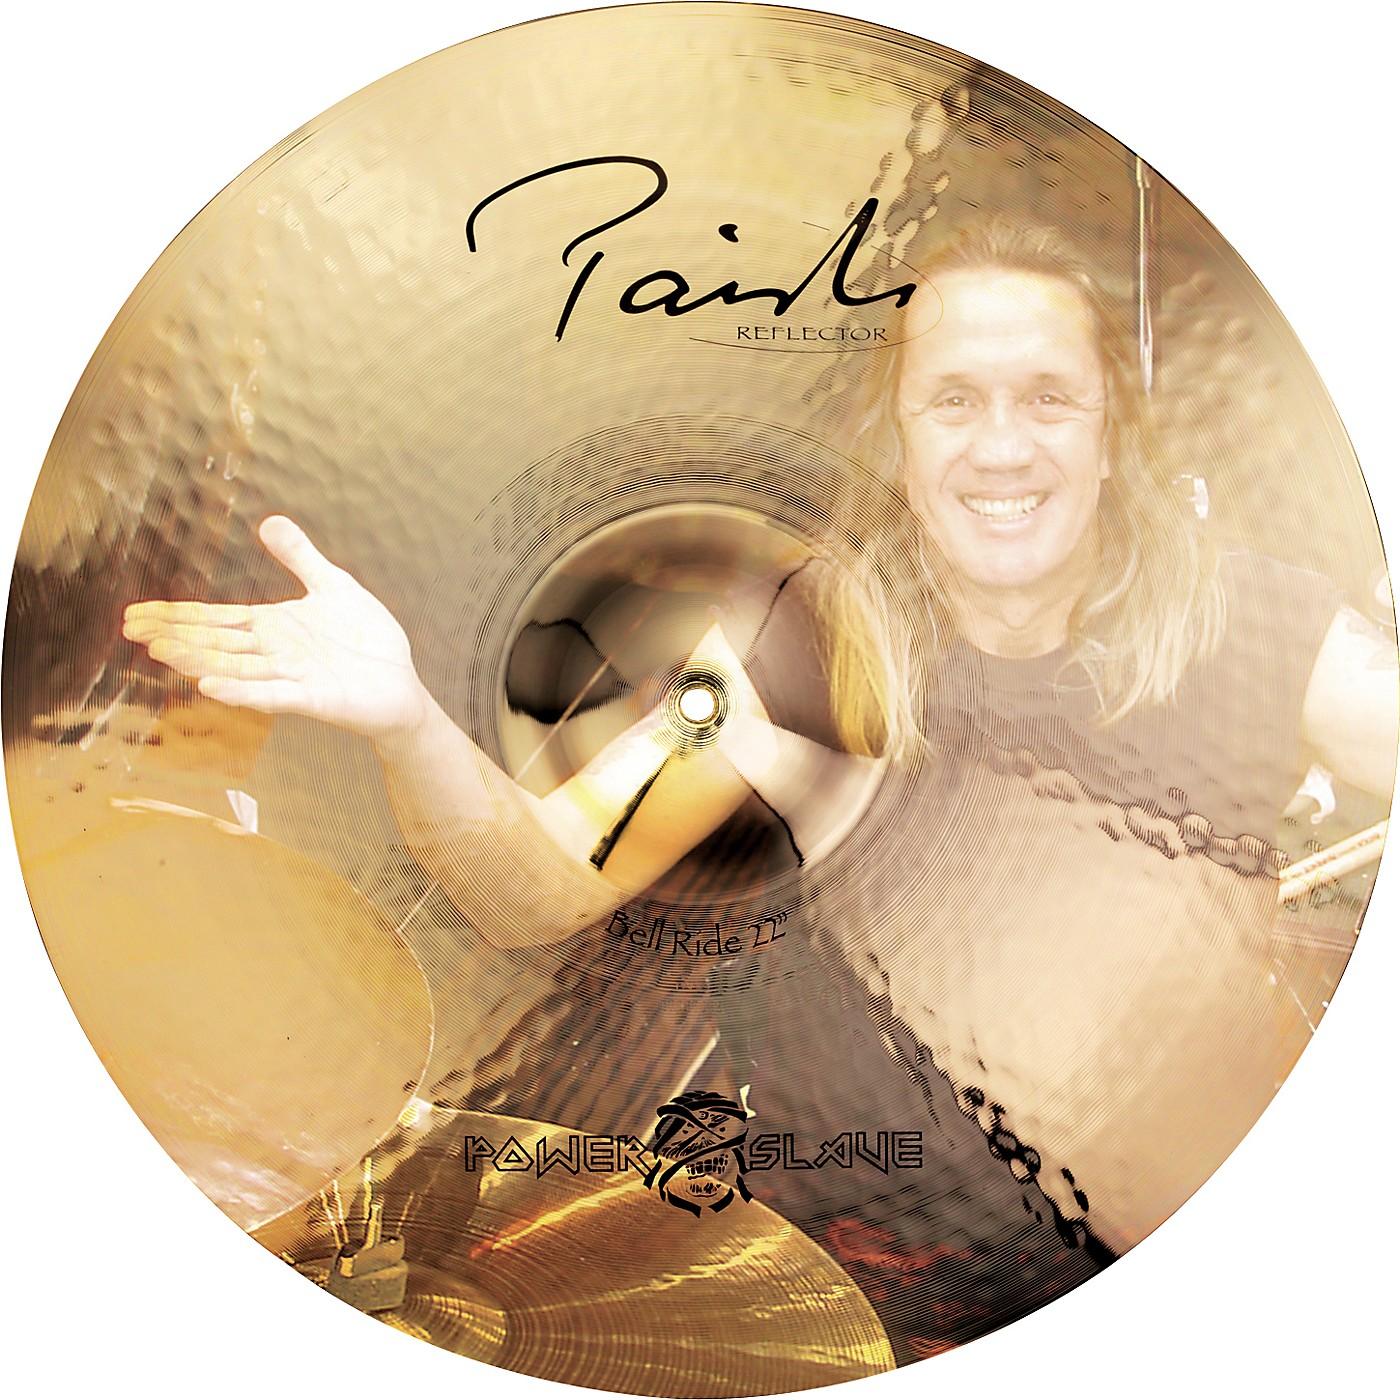 Paiste Signature Reflector Bell Ride Cymbal thumbnail